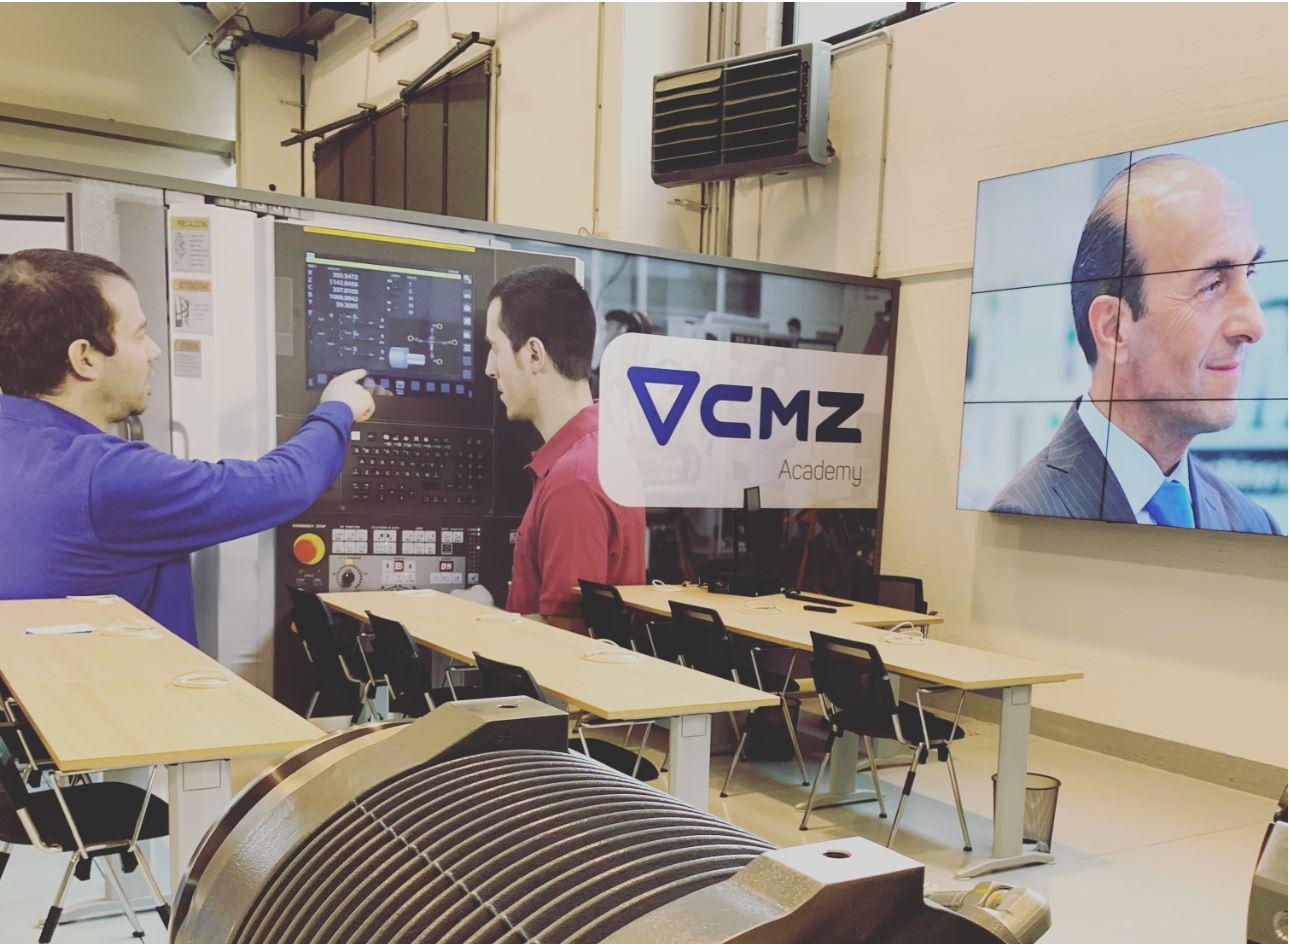 CMZ Academy